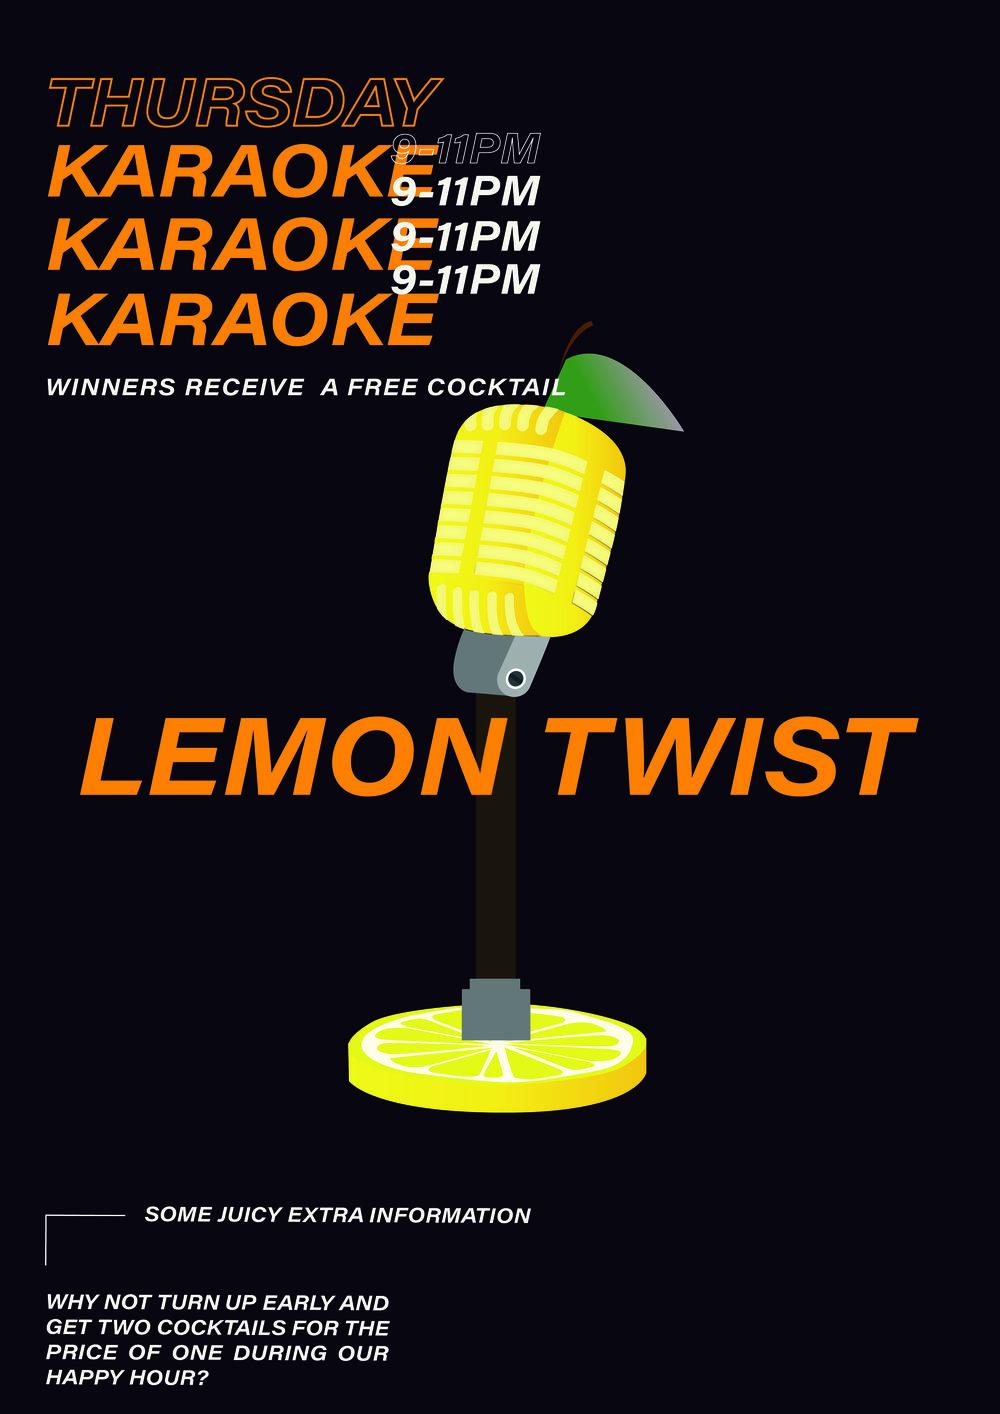 LT_Karaoke_Poster_7th_jan-01.jpg